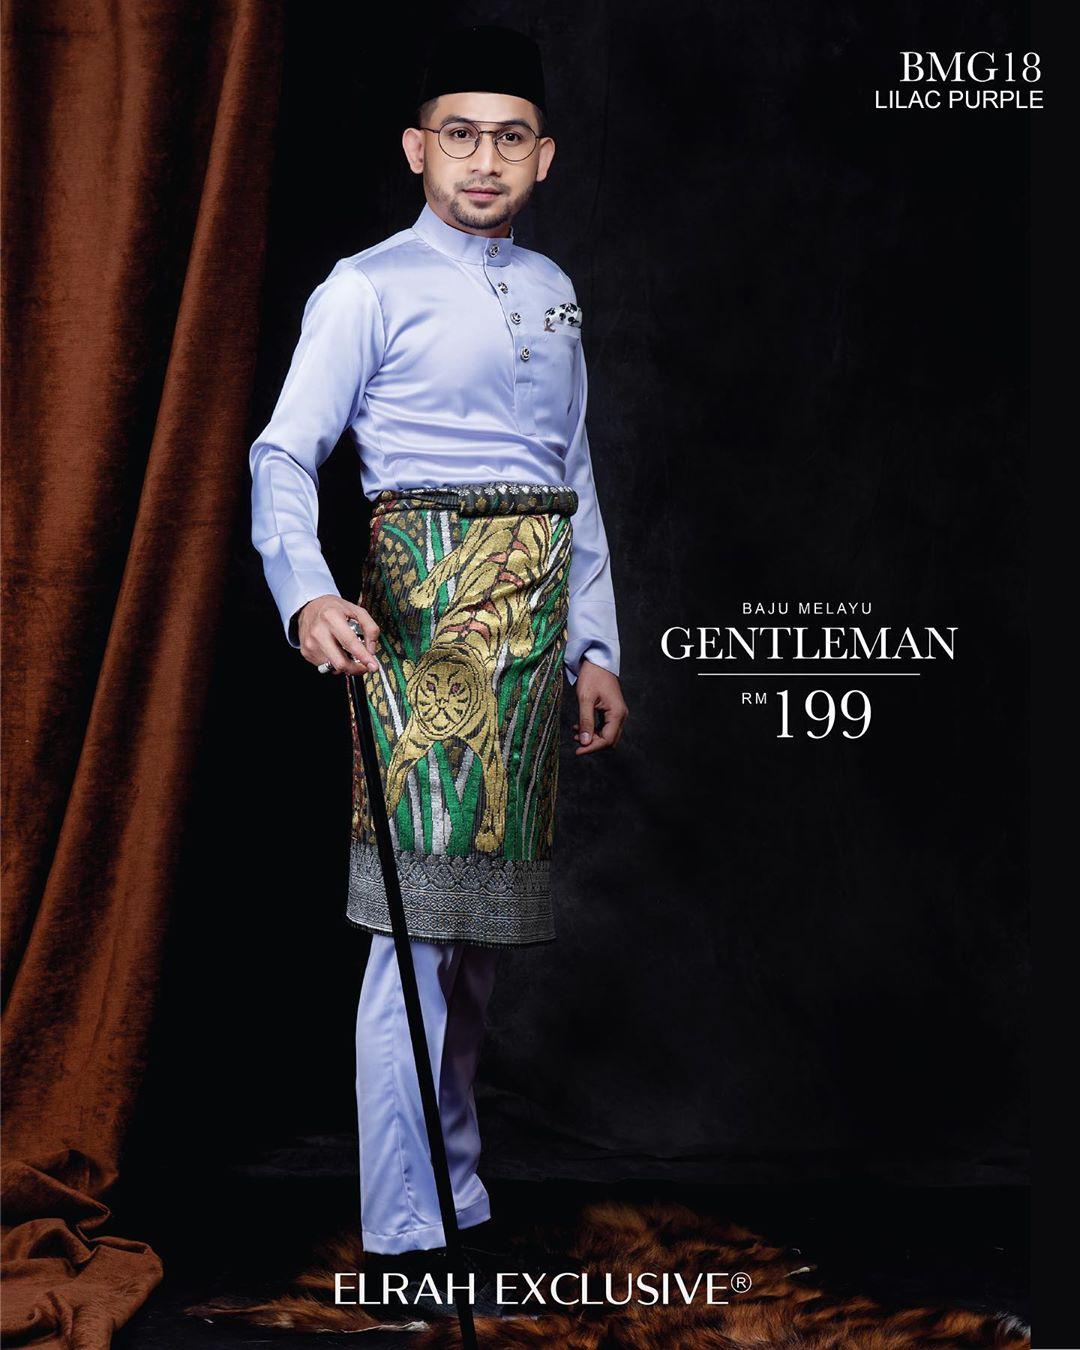 Baju Melayu Gentleman Lilac Purple